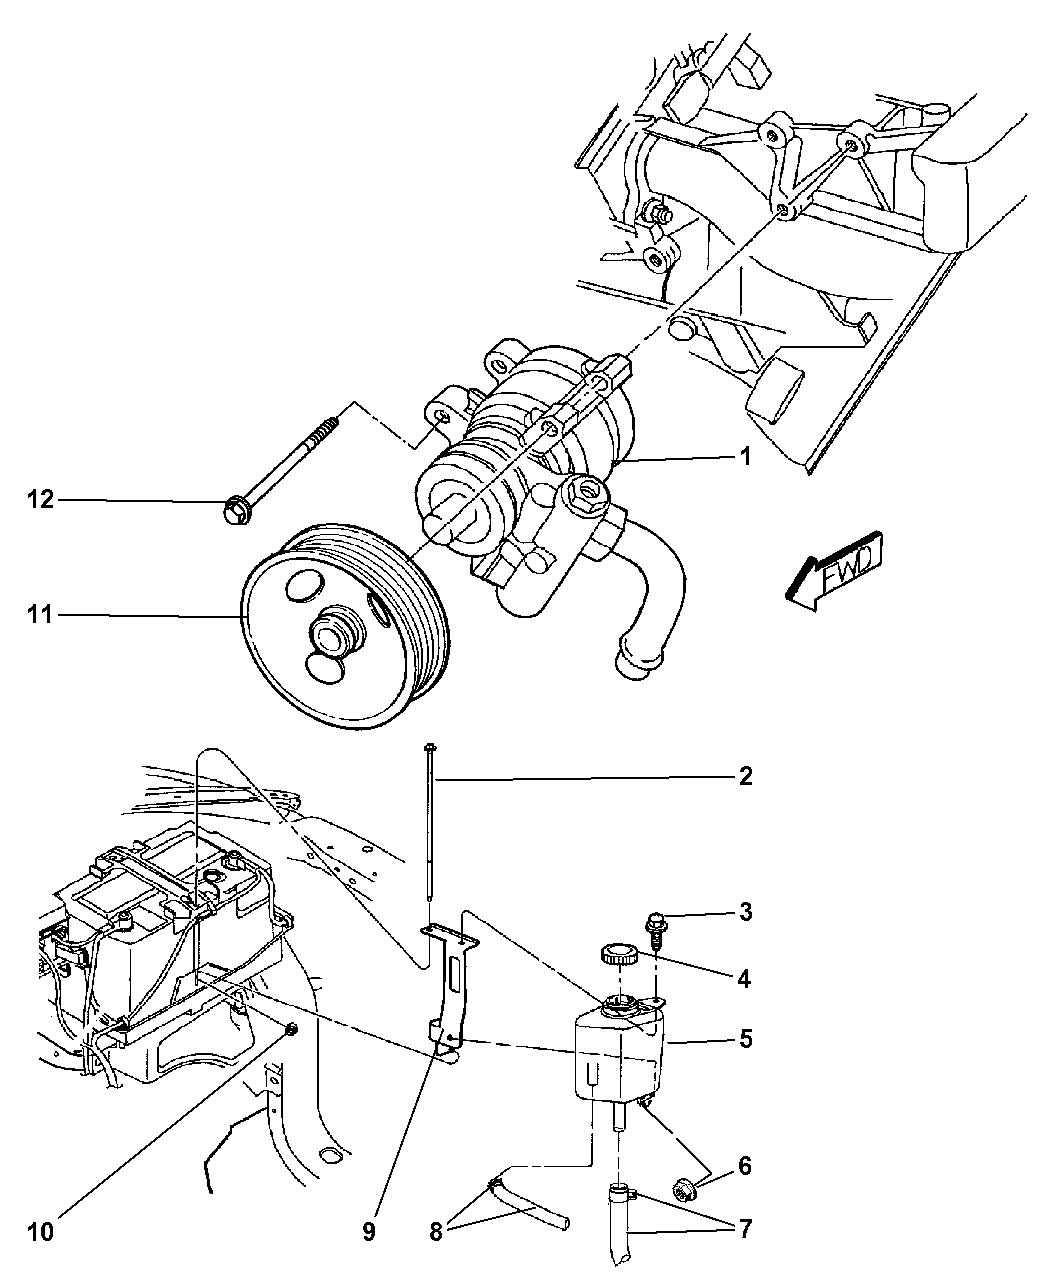 Resource T D Amp S L Amp R Ab C Ee C E Ae Ce Ba Dd E Ad A on 2002 Dodge Dakota Power Steering Parts Diagram